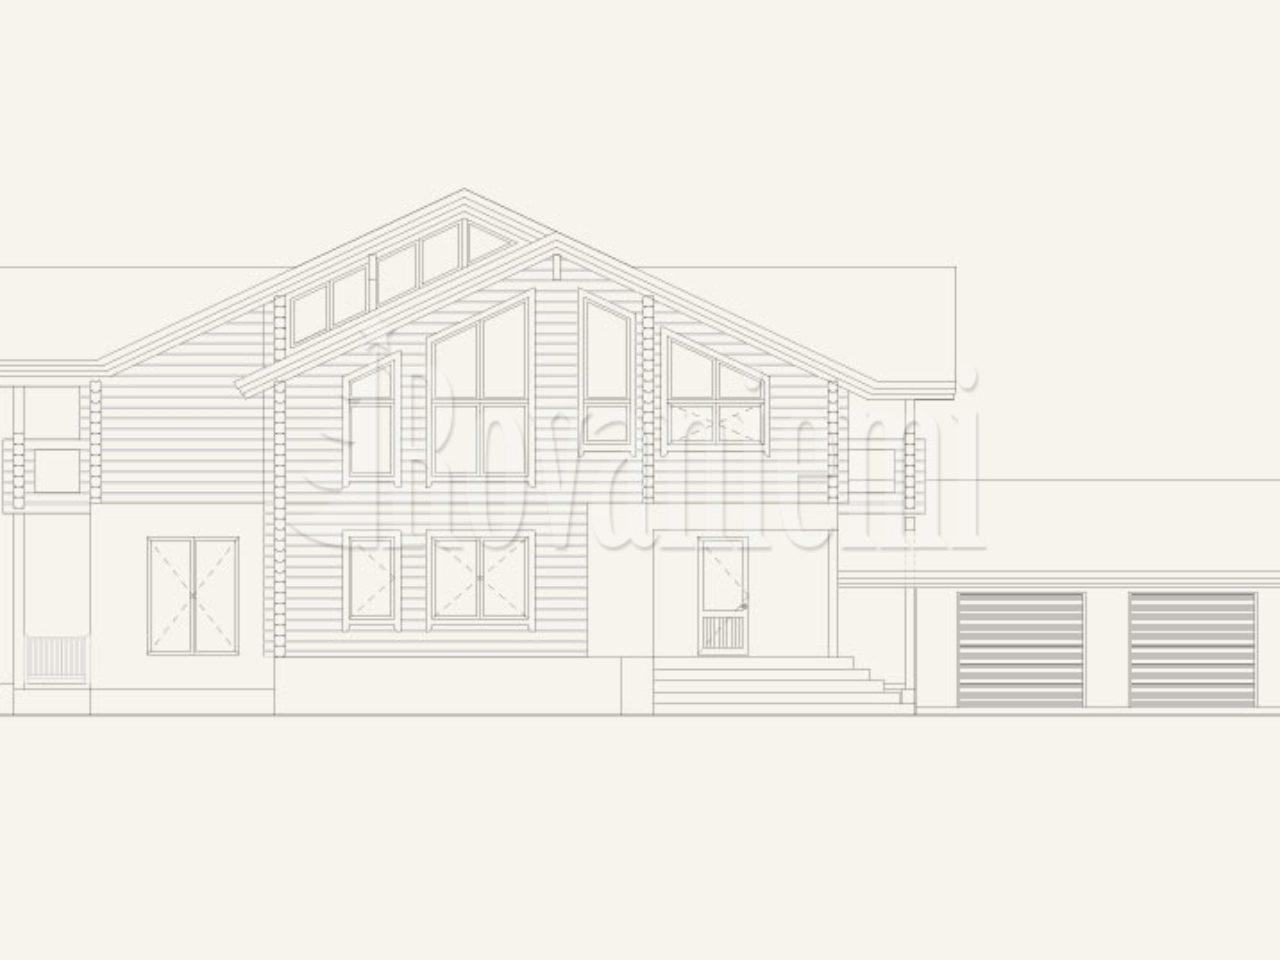 Fasad-4-Solnechnyj